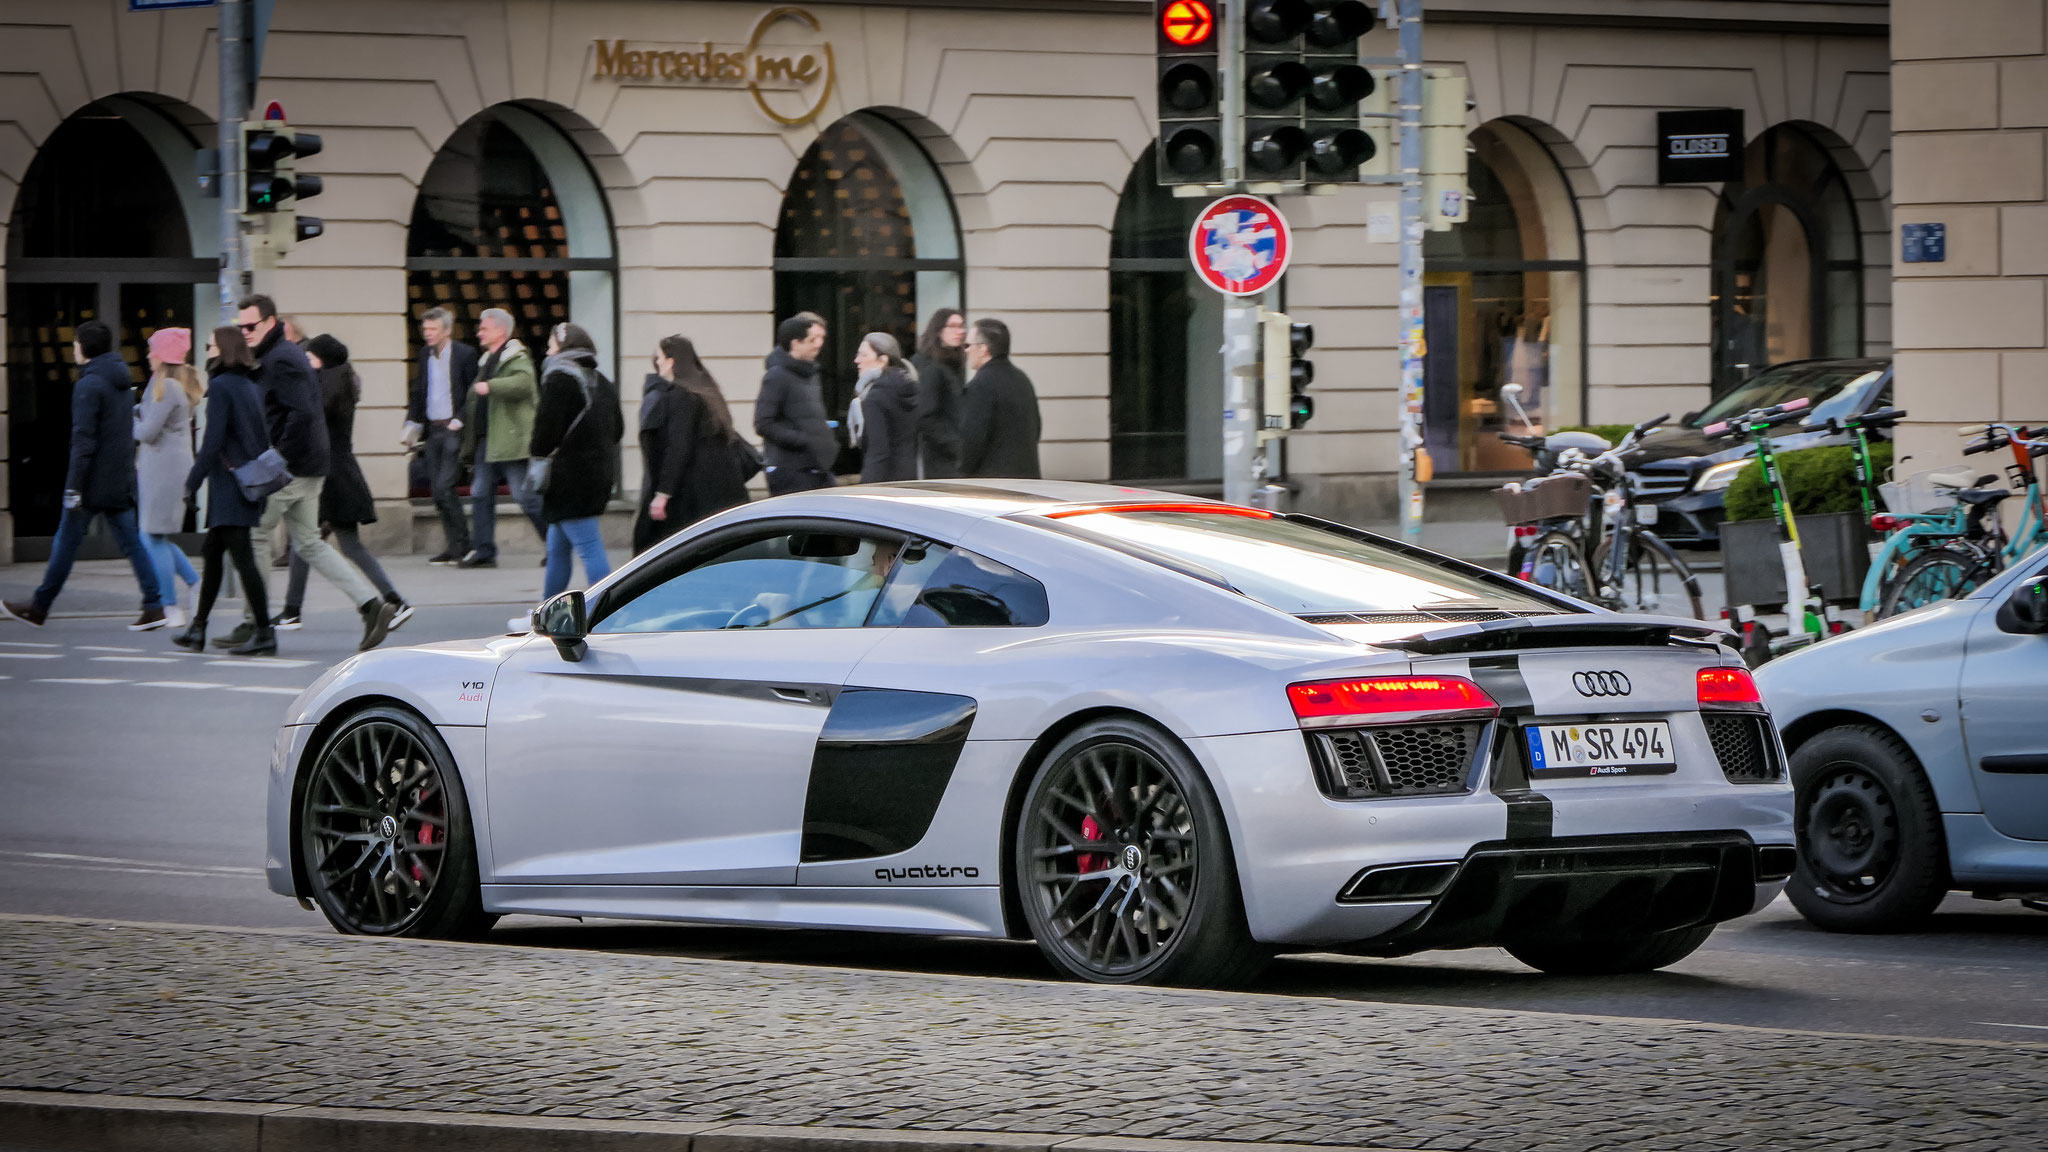 Audi R8 V10 - M-SR-494